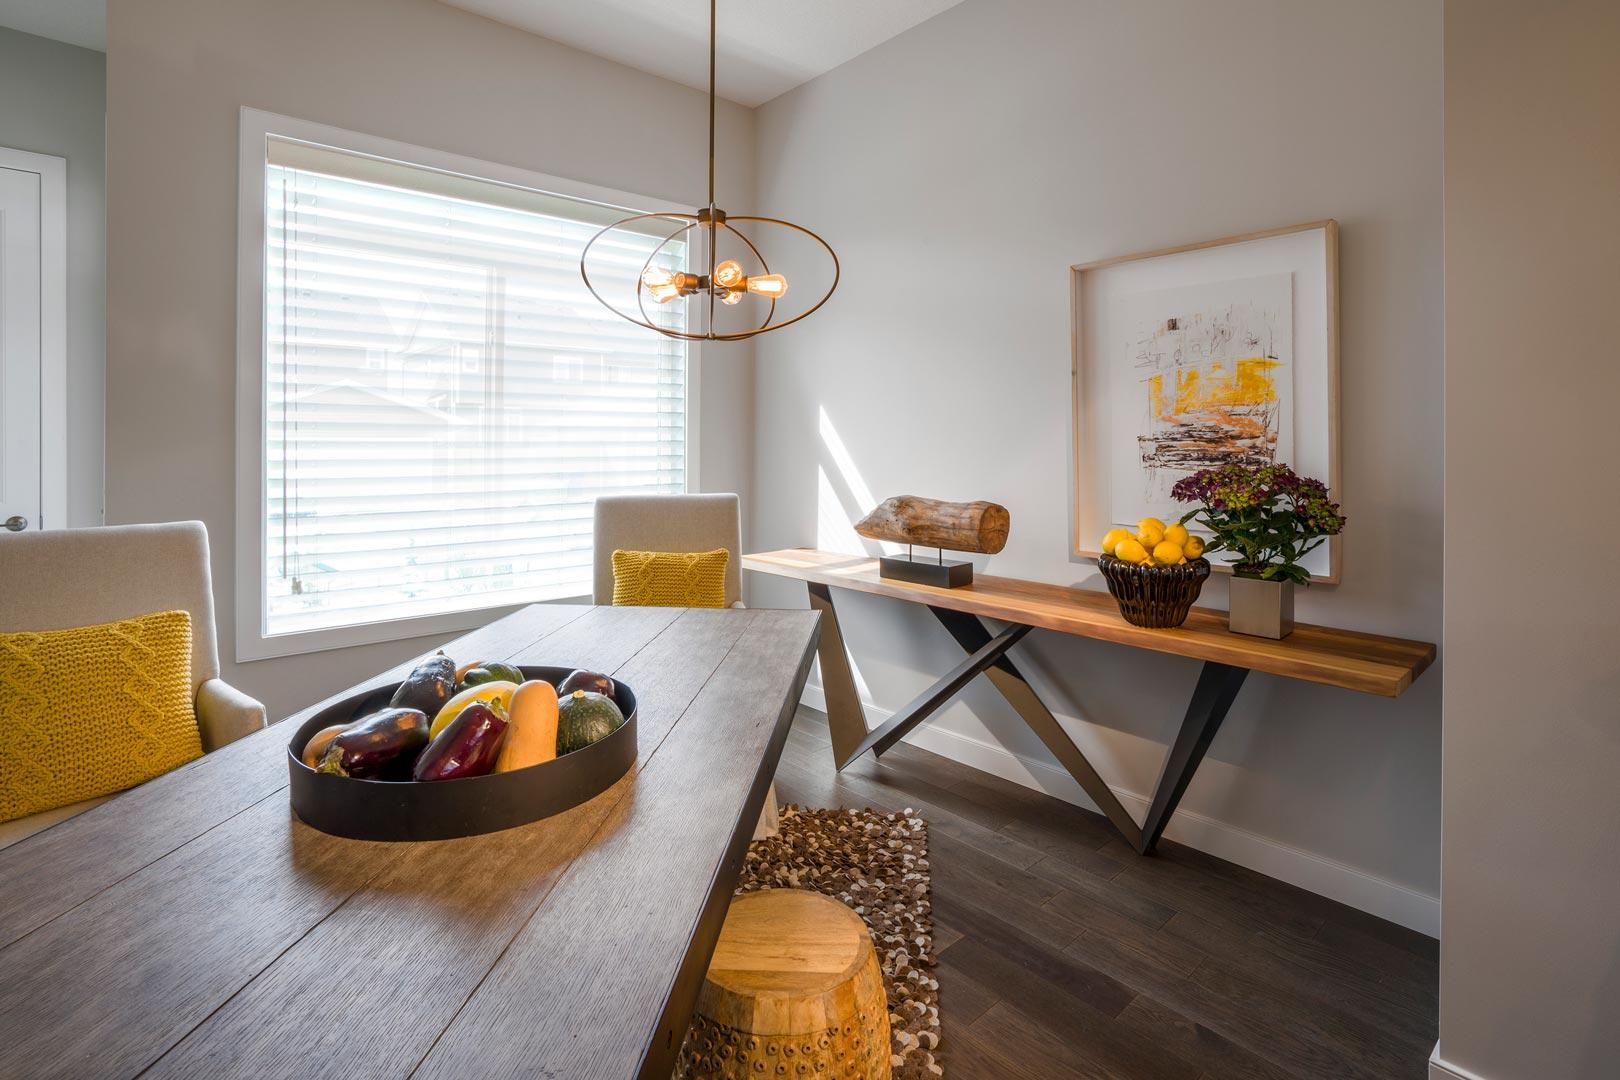 Douglas Homes Interior Image - Dining Room